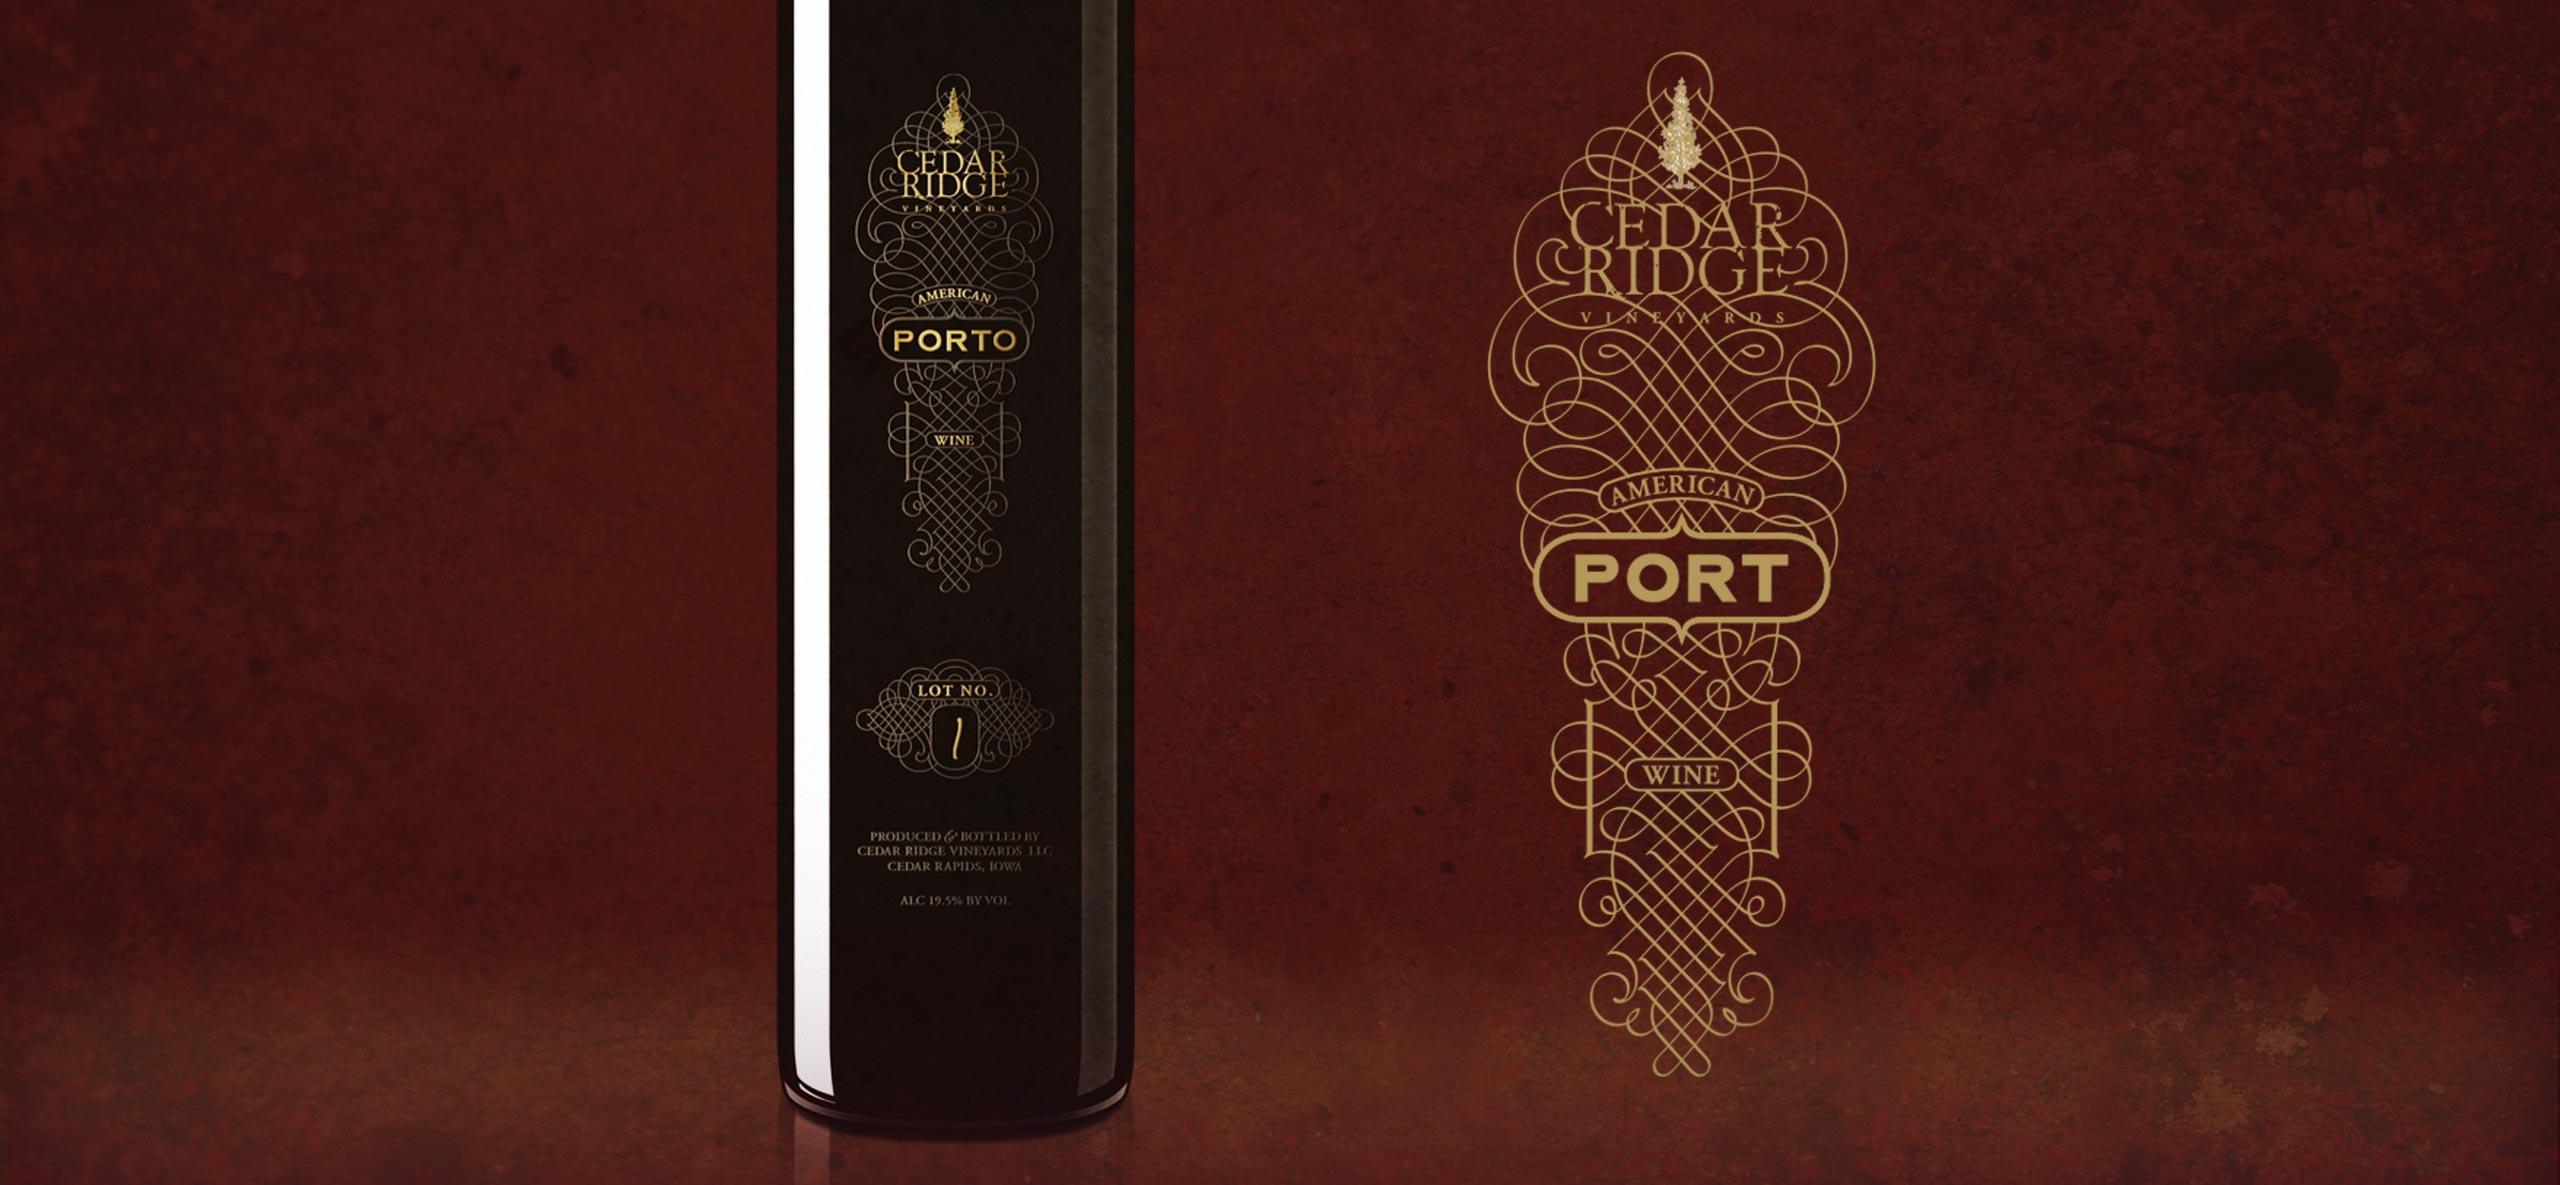 Cedar Ridge Port Label